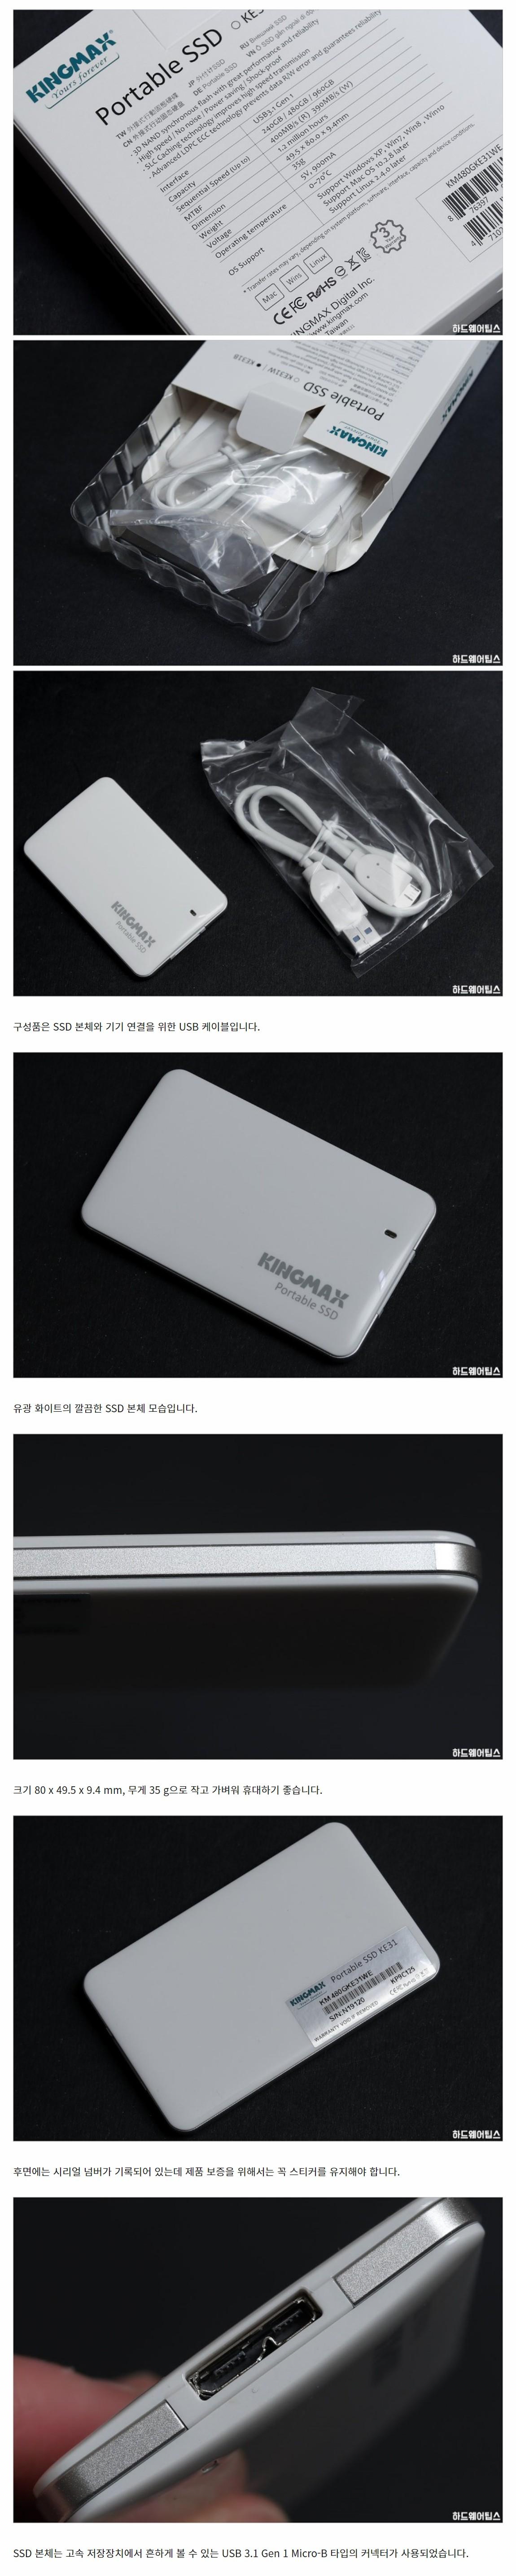 KINGMAX Portable SSD KE31 - s2.jpg